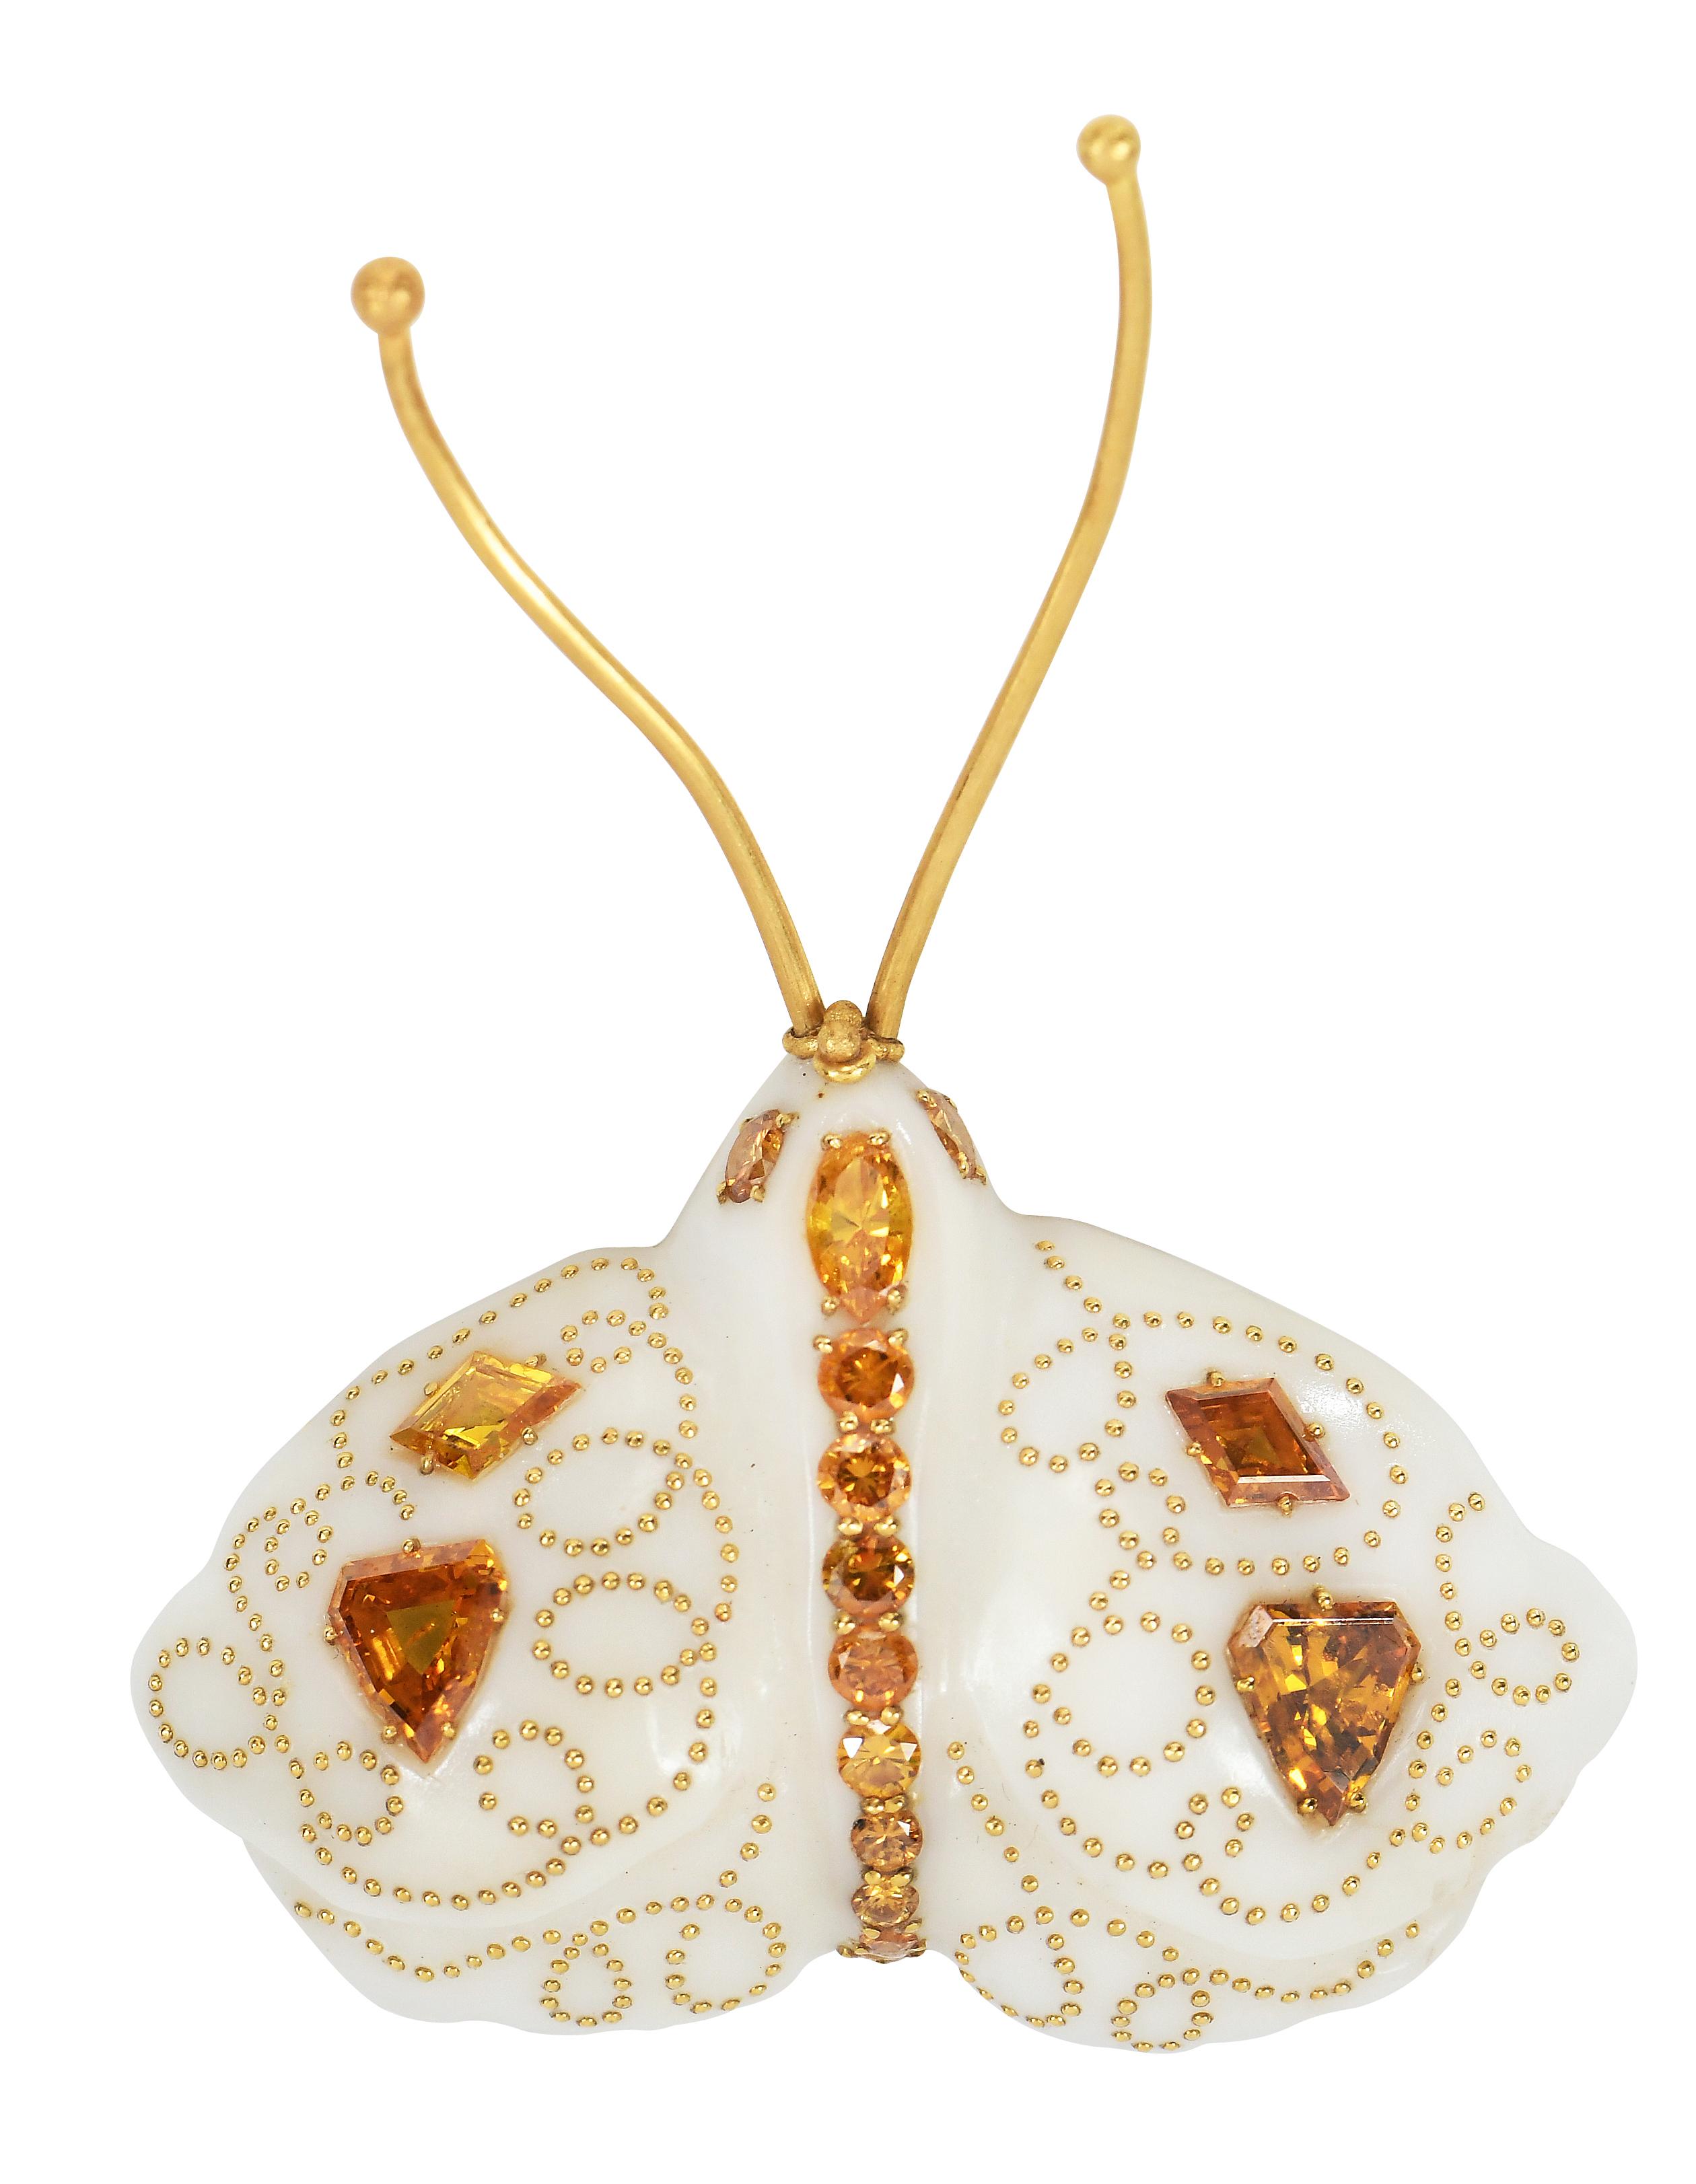 Daniel Brush 22 karat diamond and resin brooch